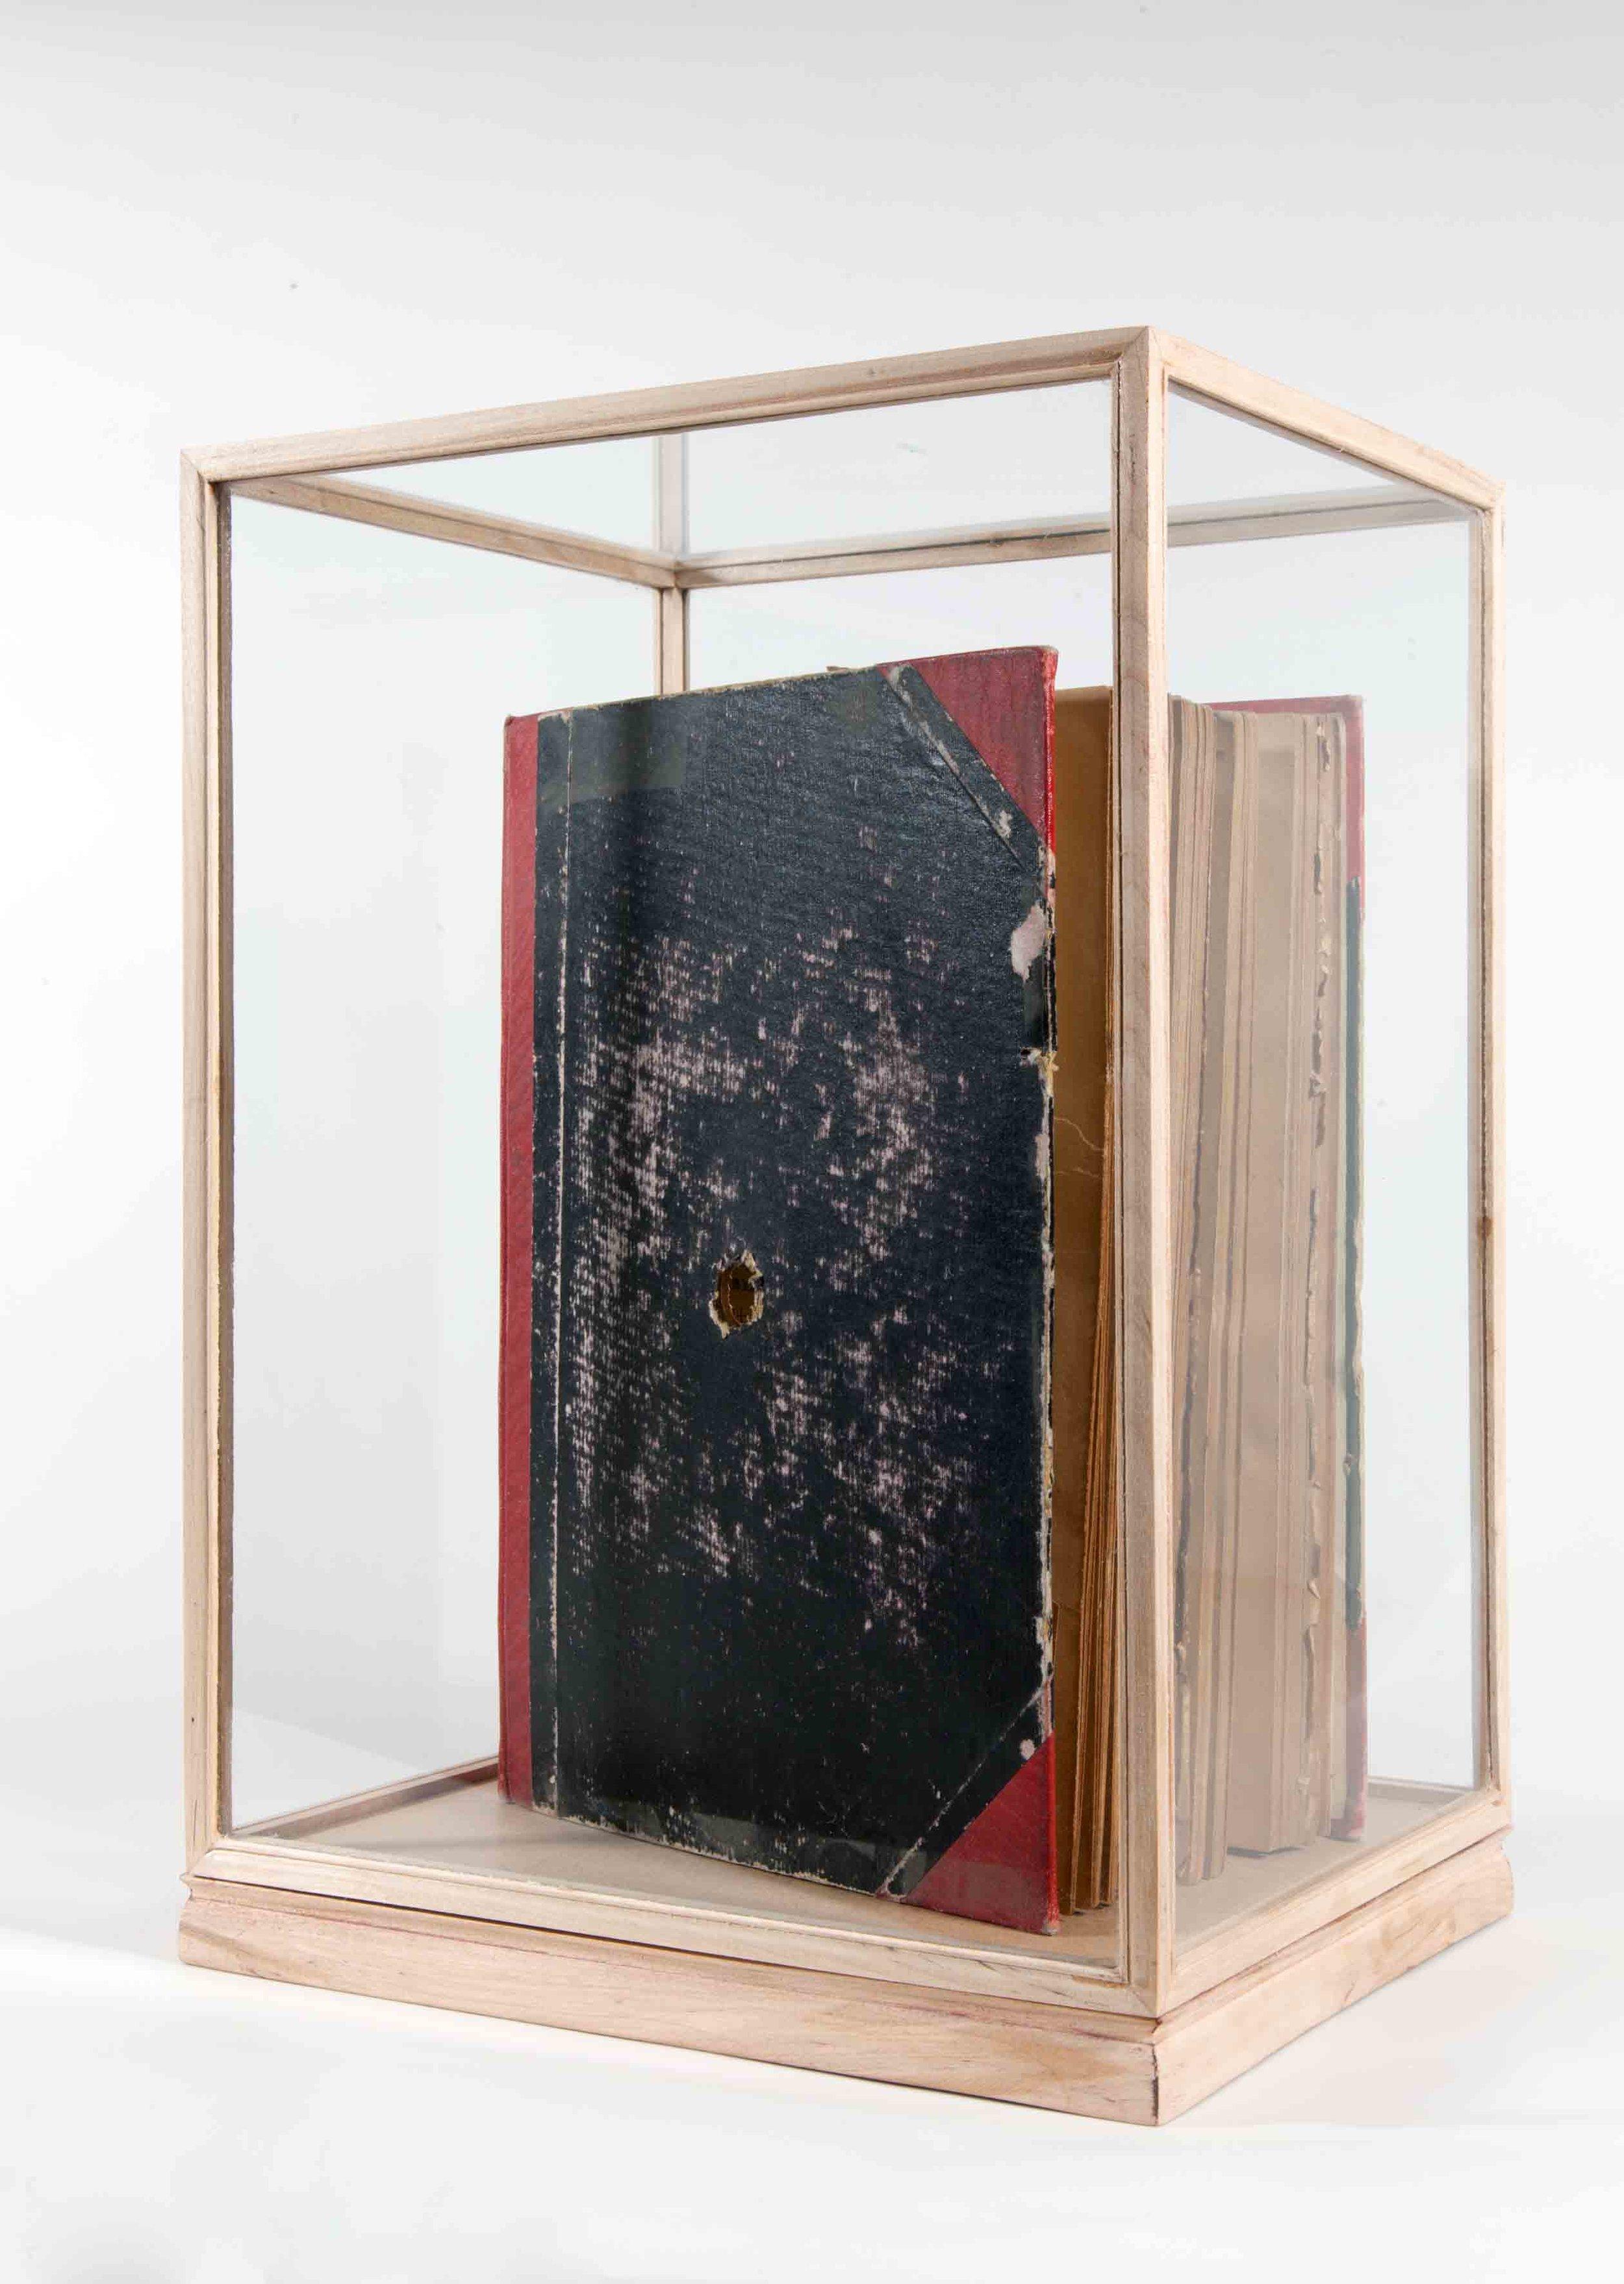 Jayne Dyer, Suppose... , 2013, book, 19 x 26 x 6cm